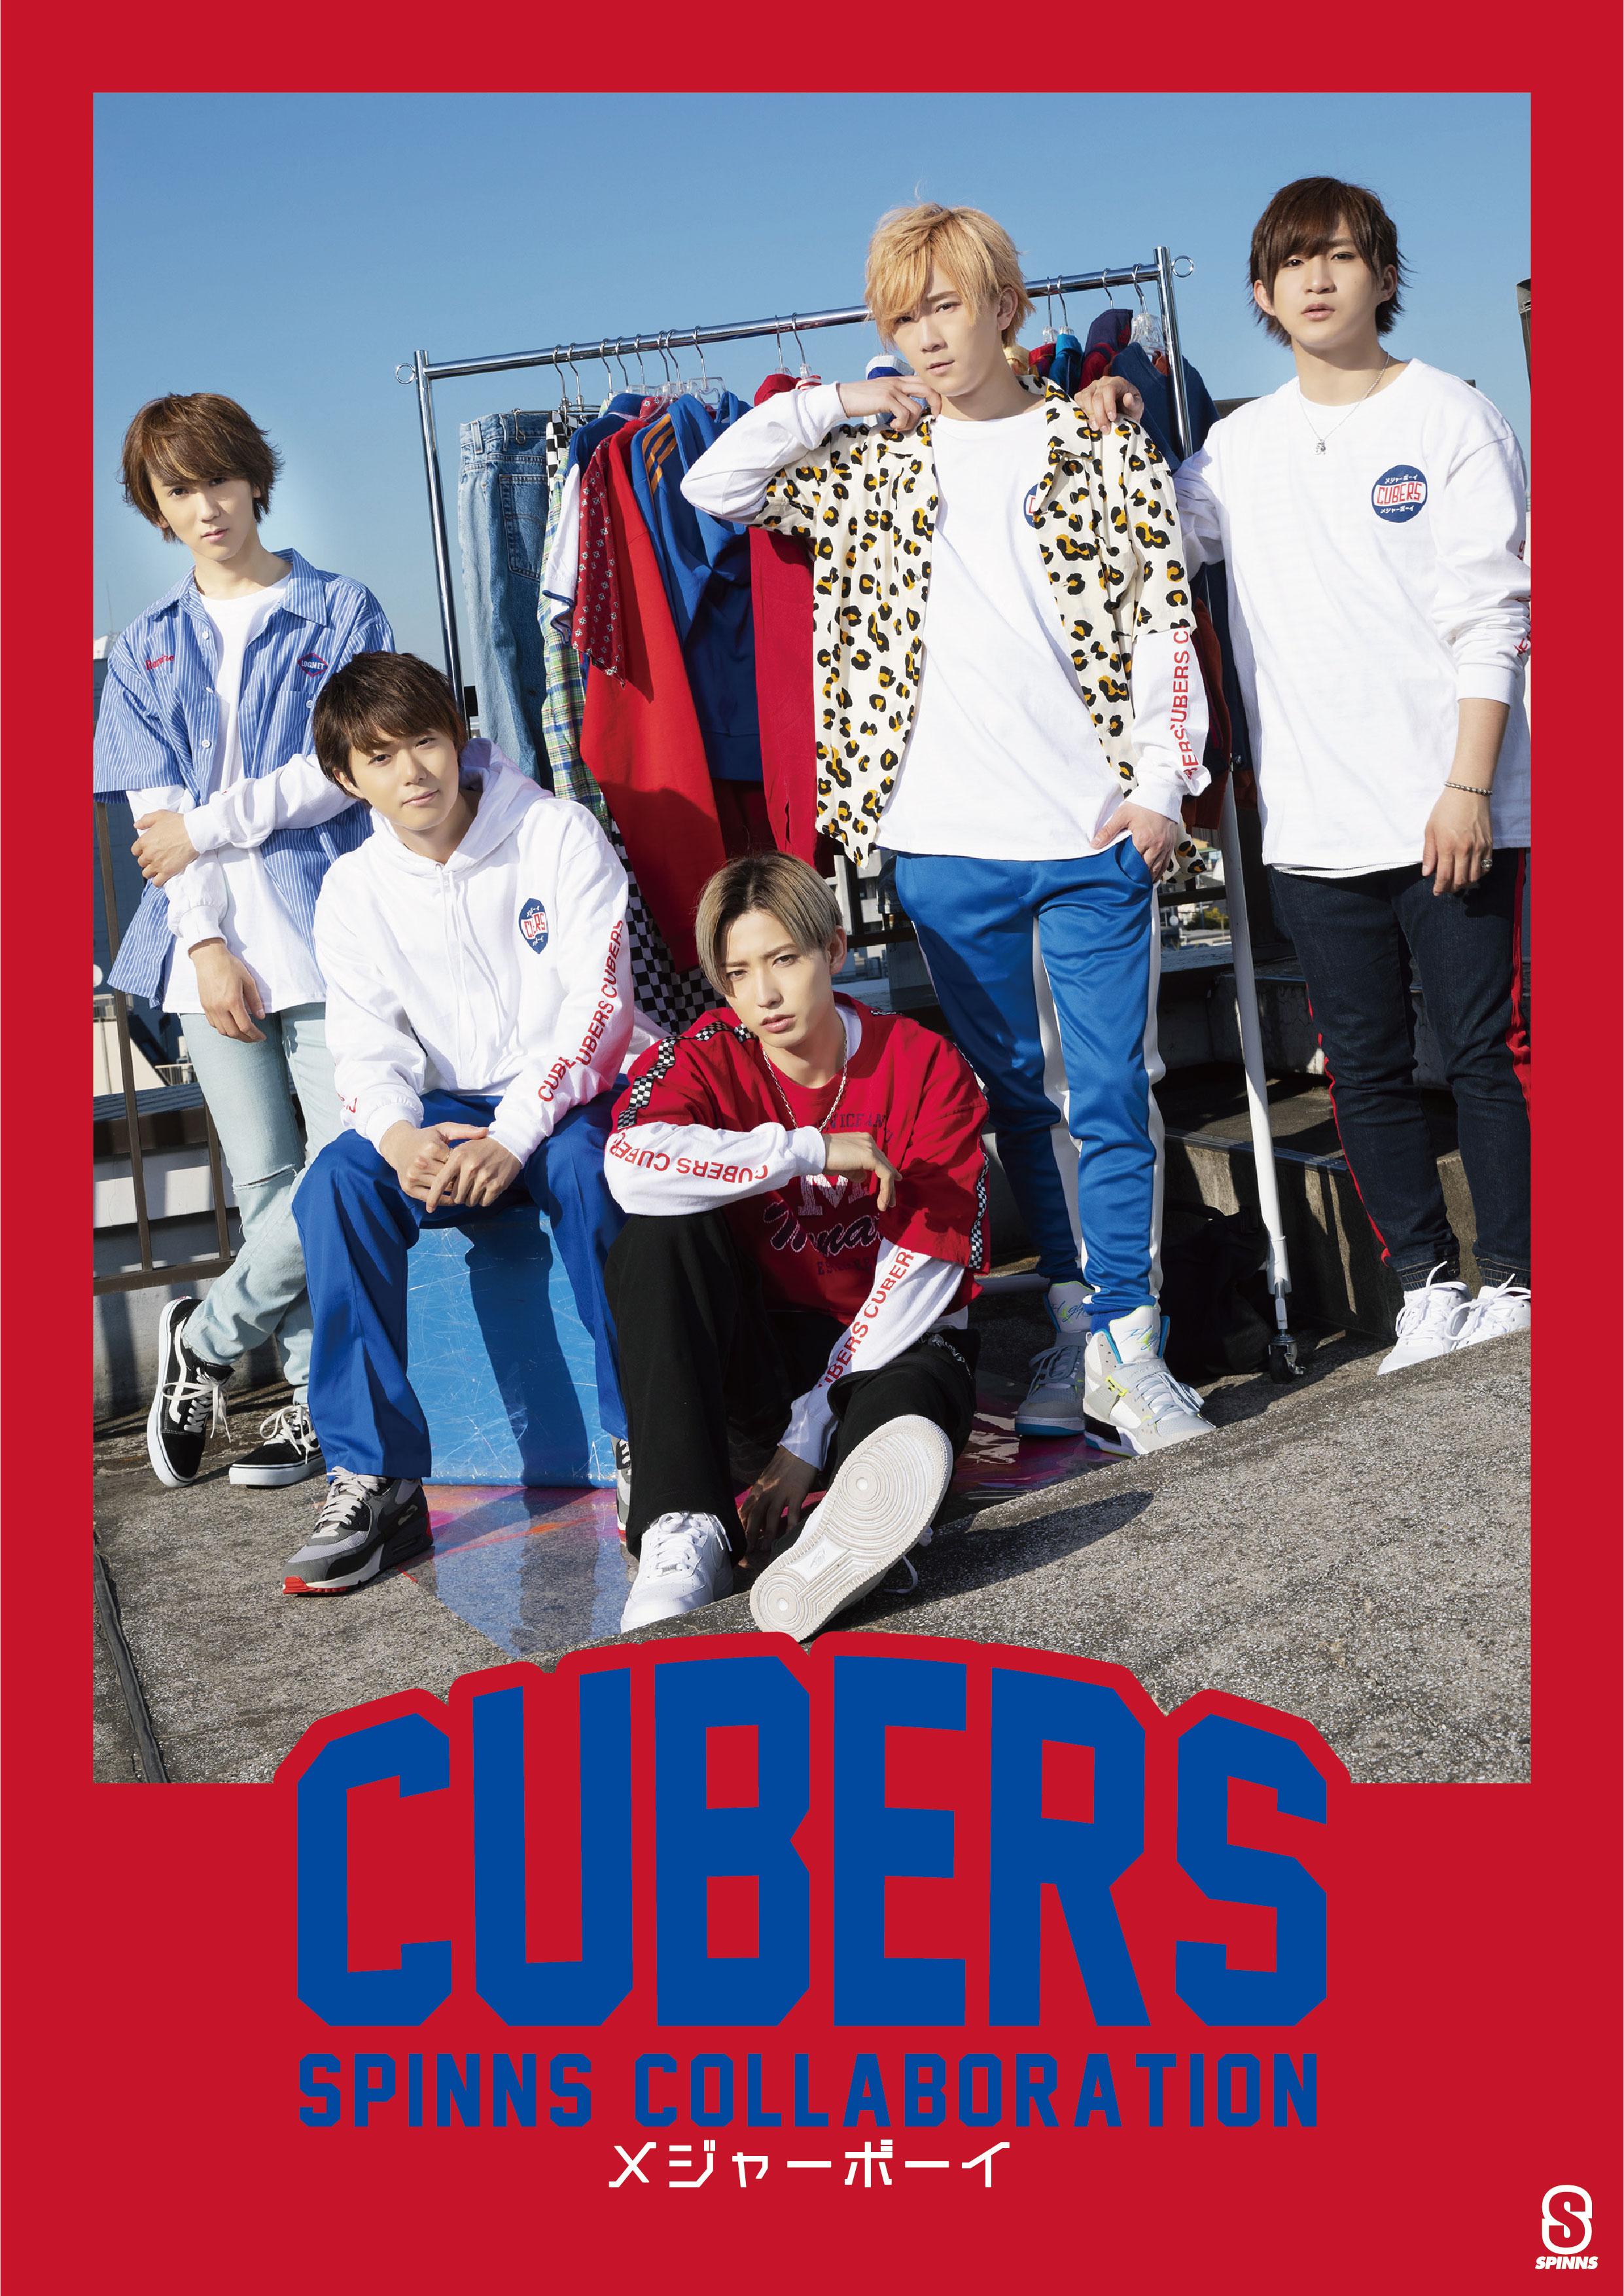 ☆★CUBERS×SPINNSコラボアイテム発売決定☆★